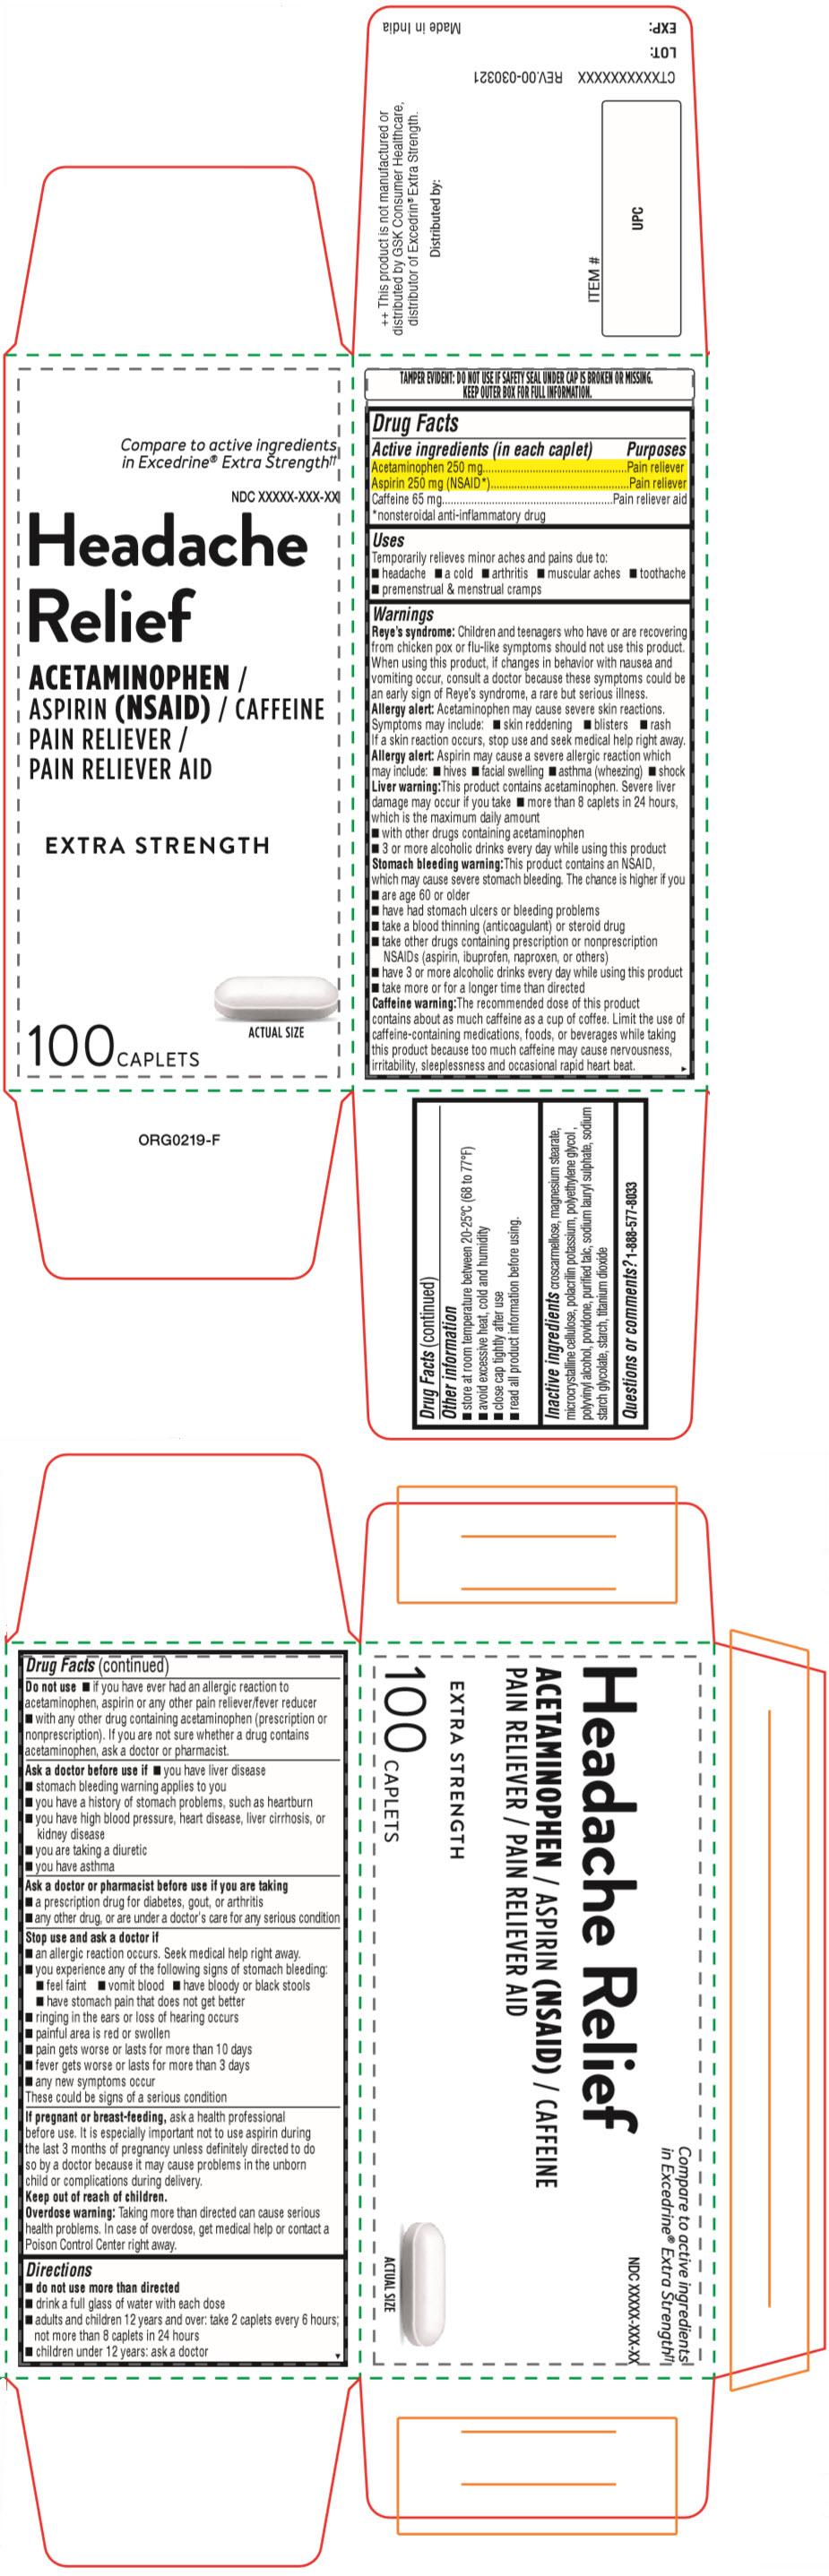 PRINCIPAL DISPLAY PANEL - 100 Caplet Bottle Carton